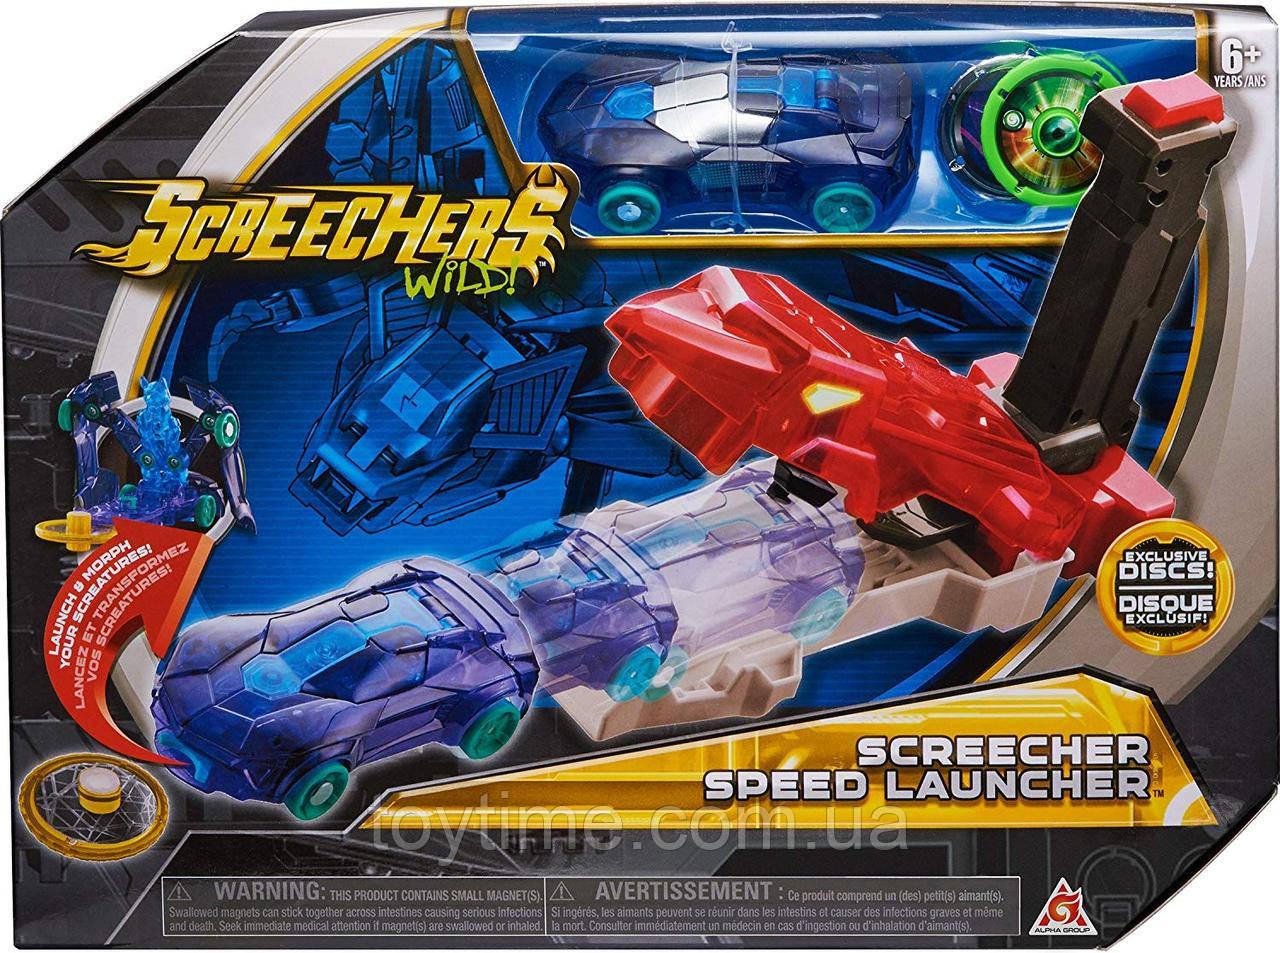 Набор Пускатель машинок Скричерс / Screechers Wild Screecher Speed Launcher Flipping Morphing Toy Car Vehicle